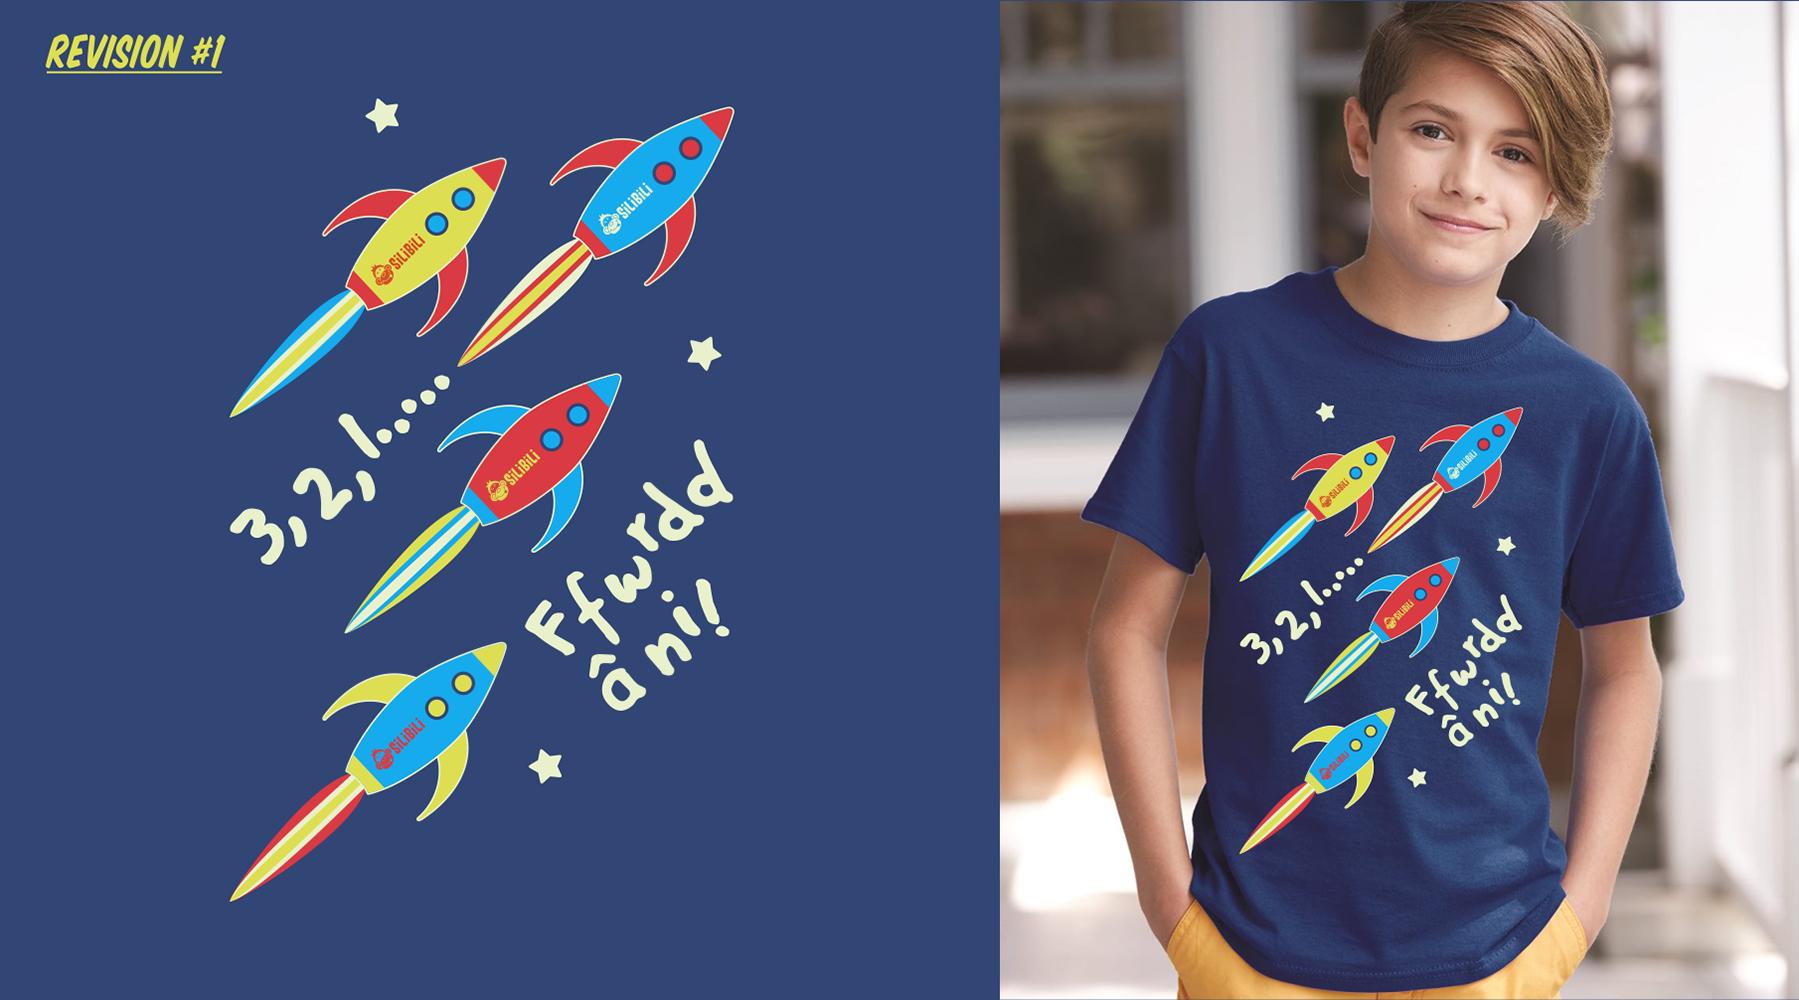 Space rocket kids t-shirt design